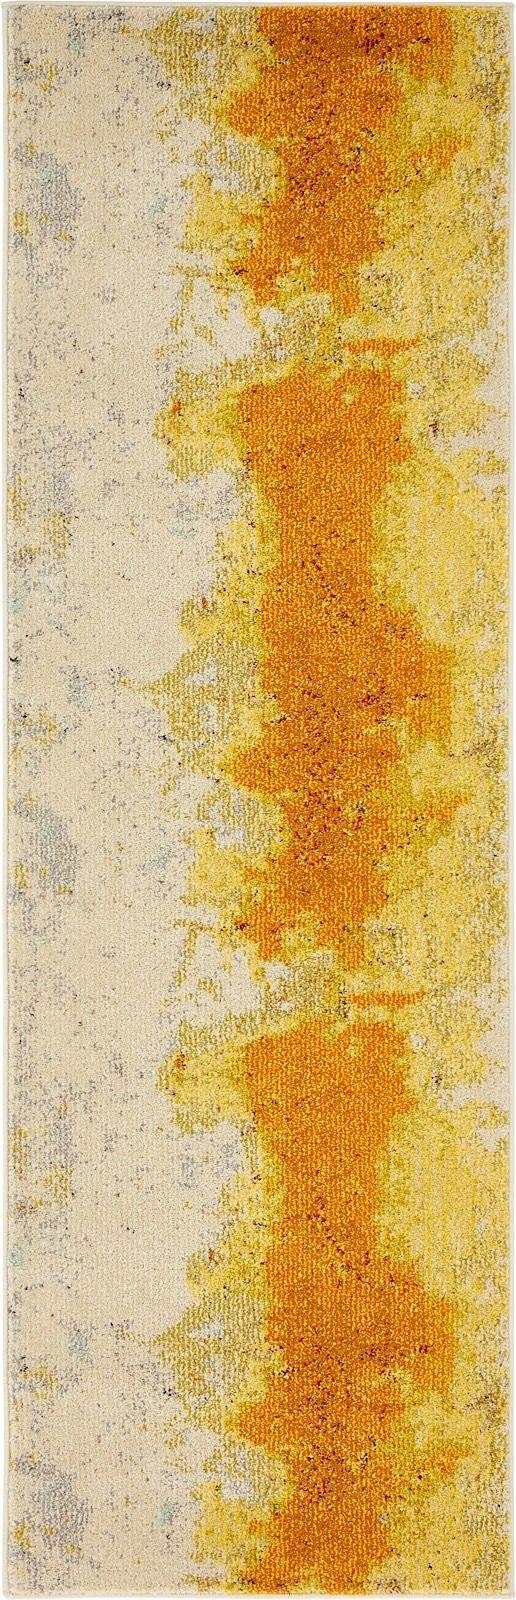 rugpal estelle contemporary area rug collection